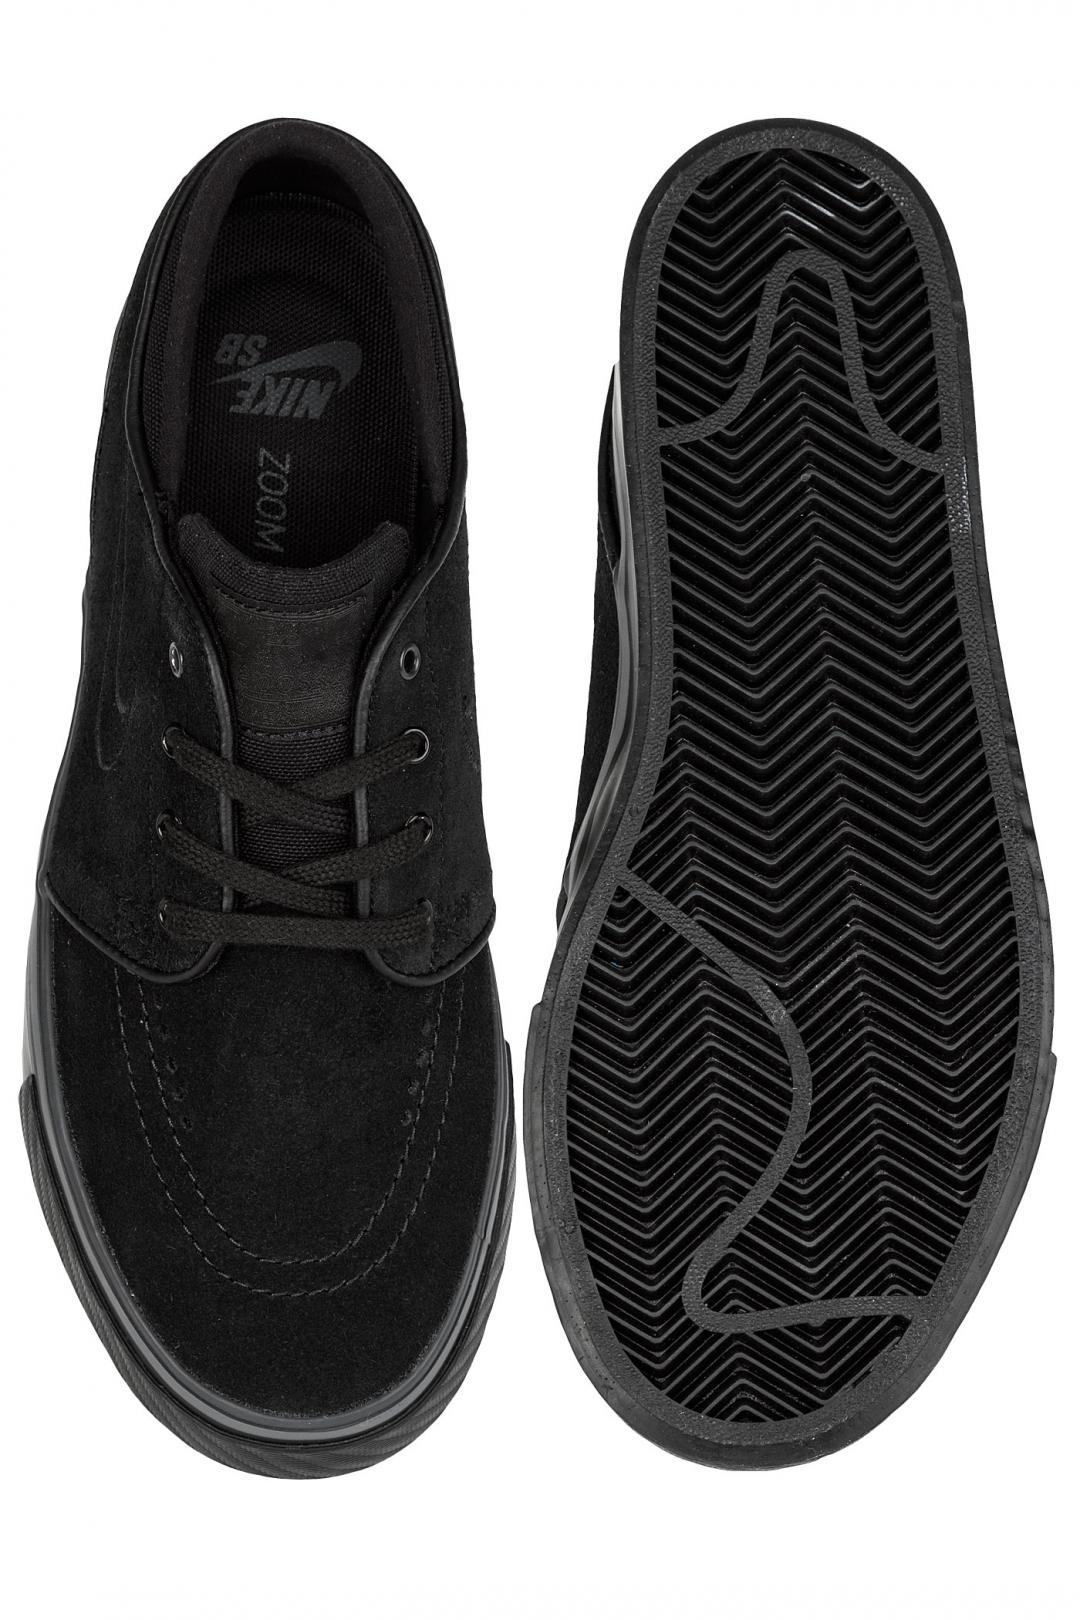 Donna Nike SB Zoom Stefan Janoski black black black | Sneakers low top